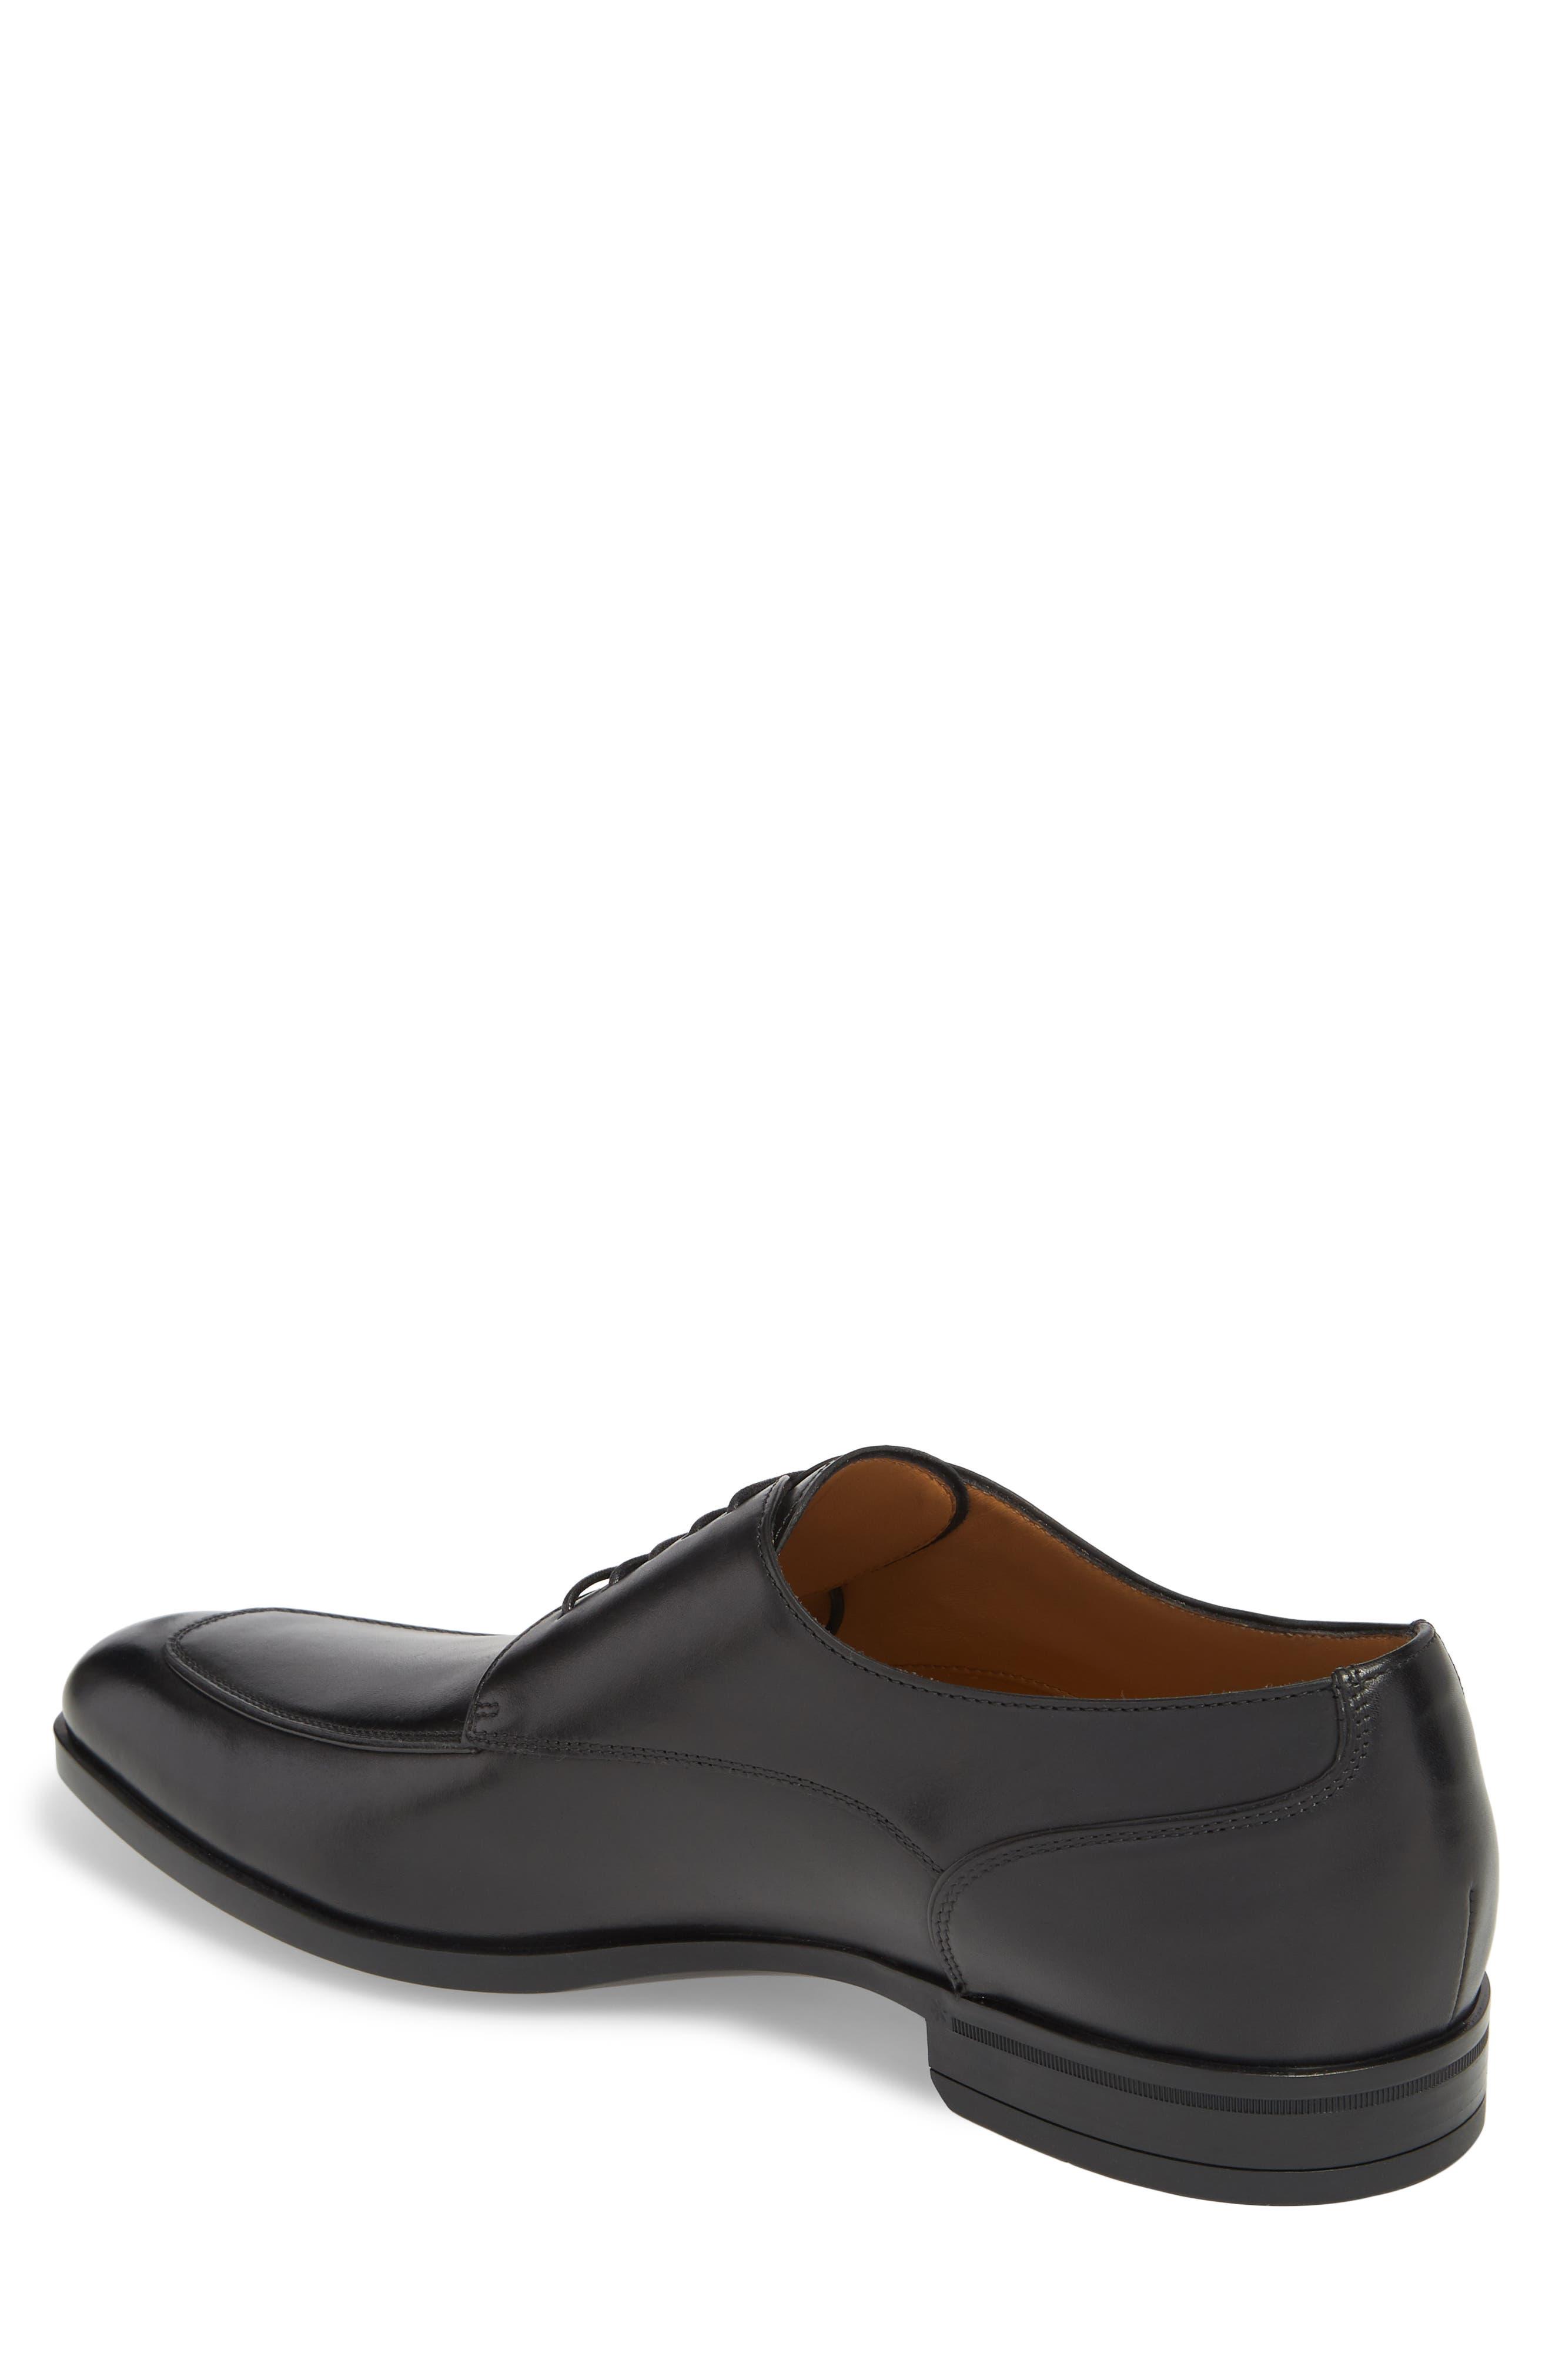 Hugo Boss Portland Apron Toe Derby,                             Alternate thumbnail 2, color,                             BLACK LEATHER